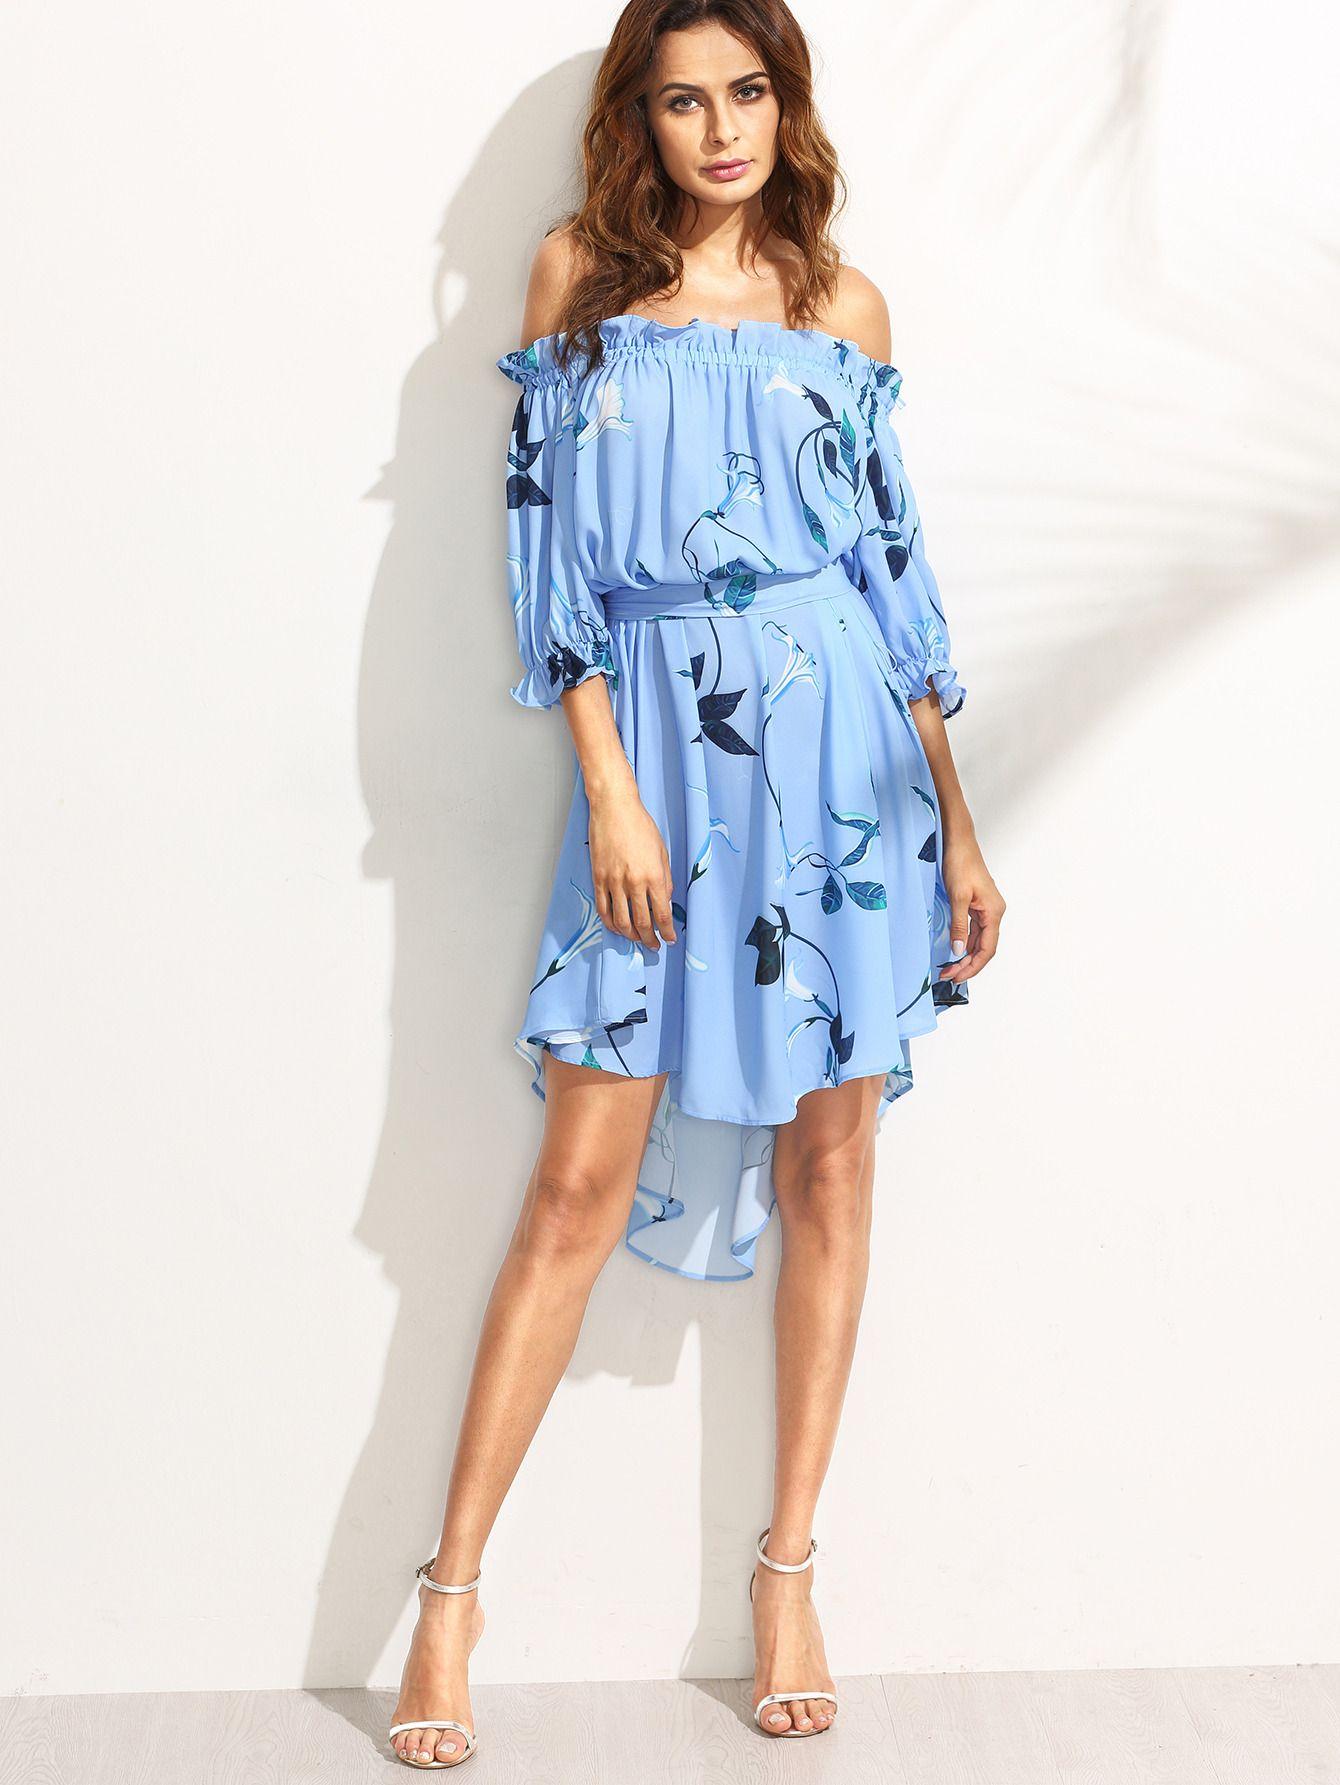 dd1d9d2c26 Shop Multicolor Print Off The Shoulder High Low Dress online. SheIn offers  Multicolor Print Off The Shoulder High Low Dress & more to fit your…